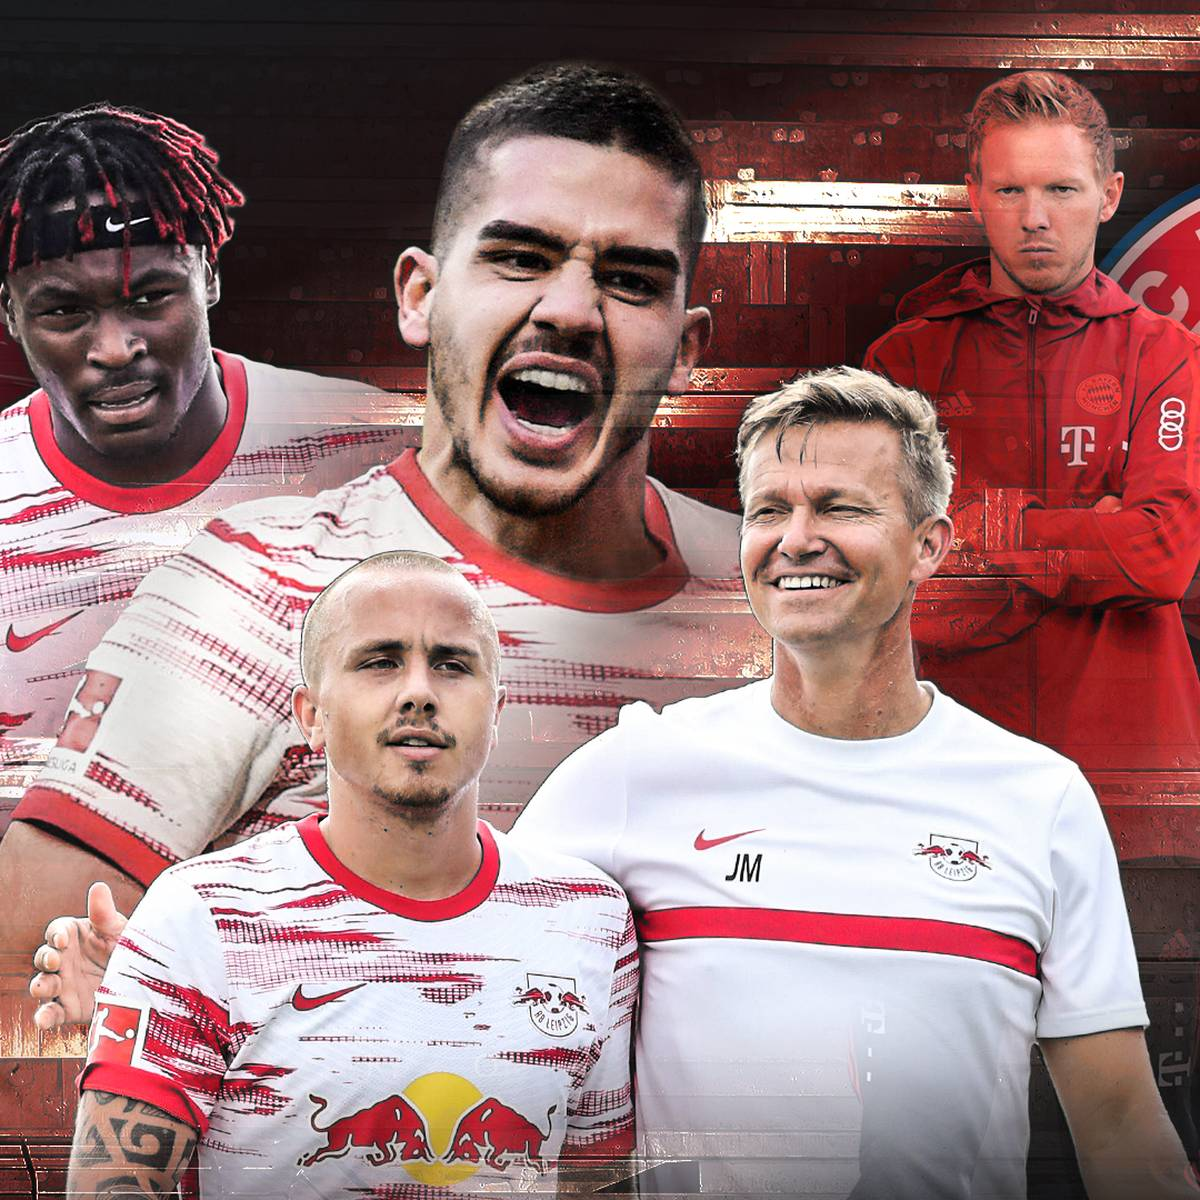 Angriff auf FC Bayern RB Leipzig trotz Corona im Kaufrausch